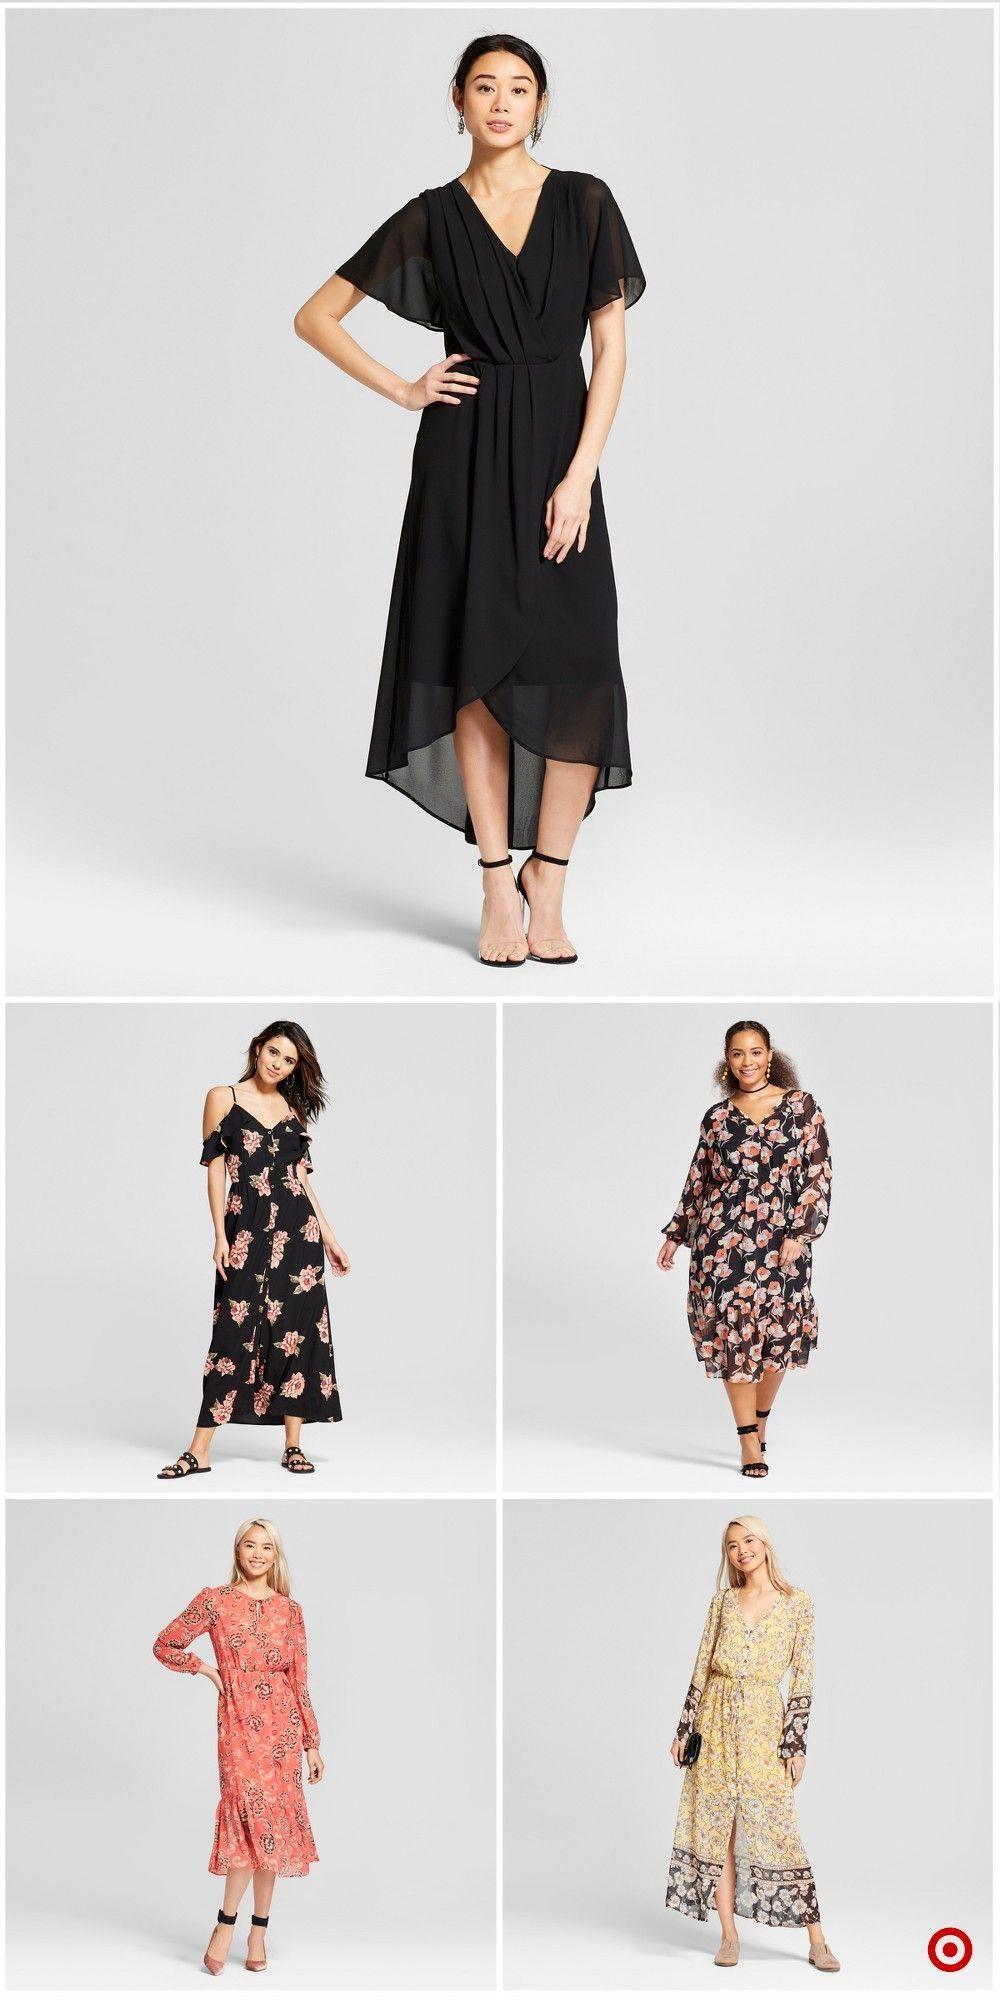 517efbaeb8 Maxi Dresses On Sale Target - Gomes Weine AG